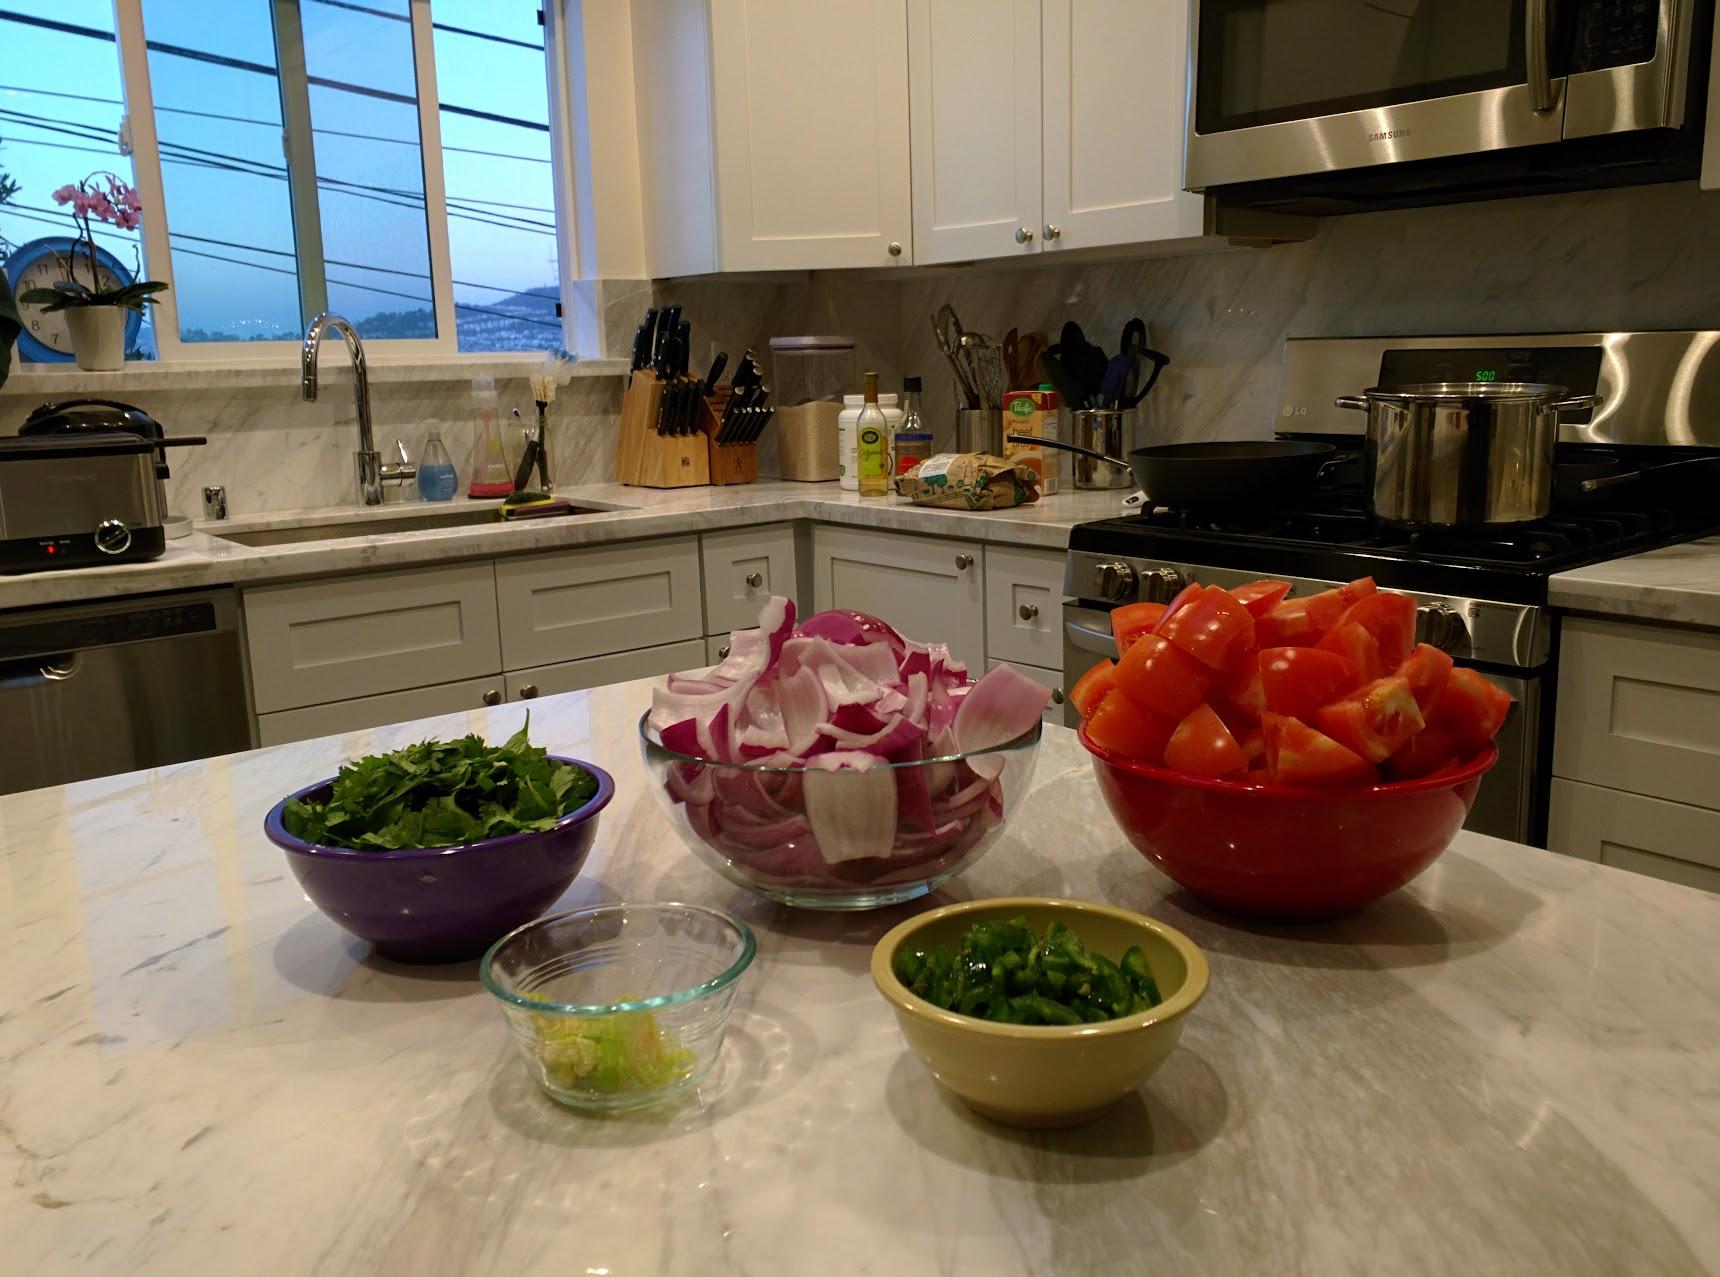 Veggies in bowls